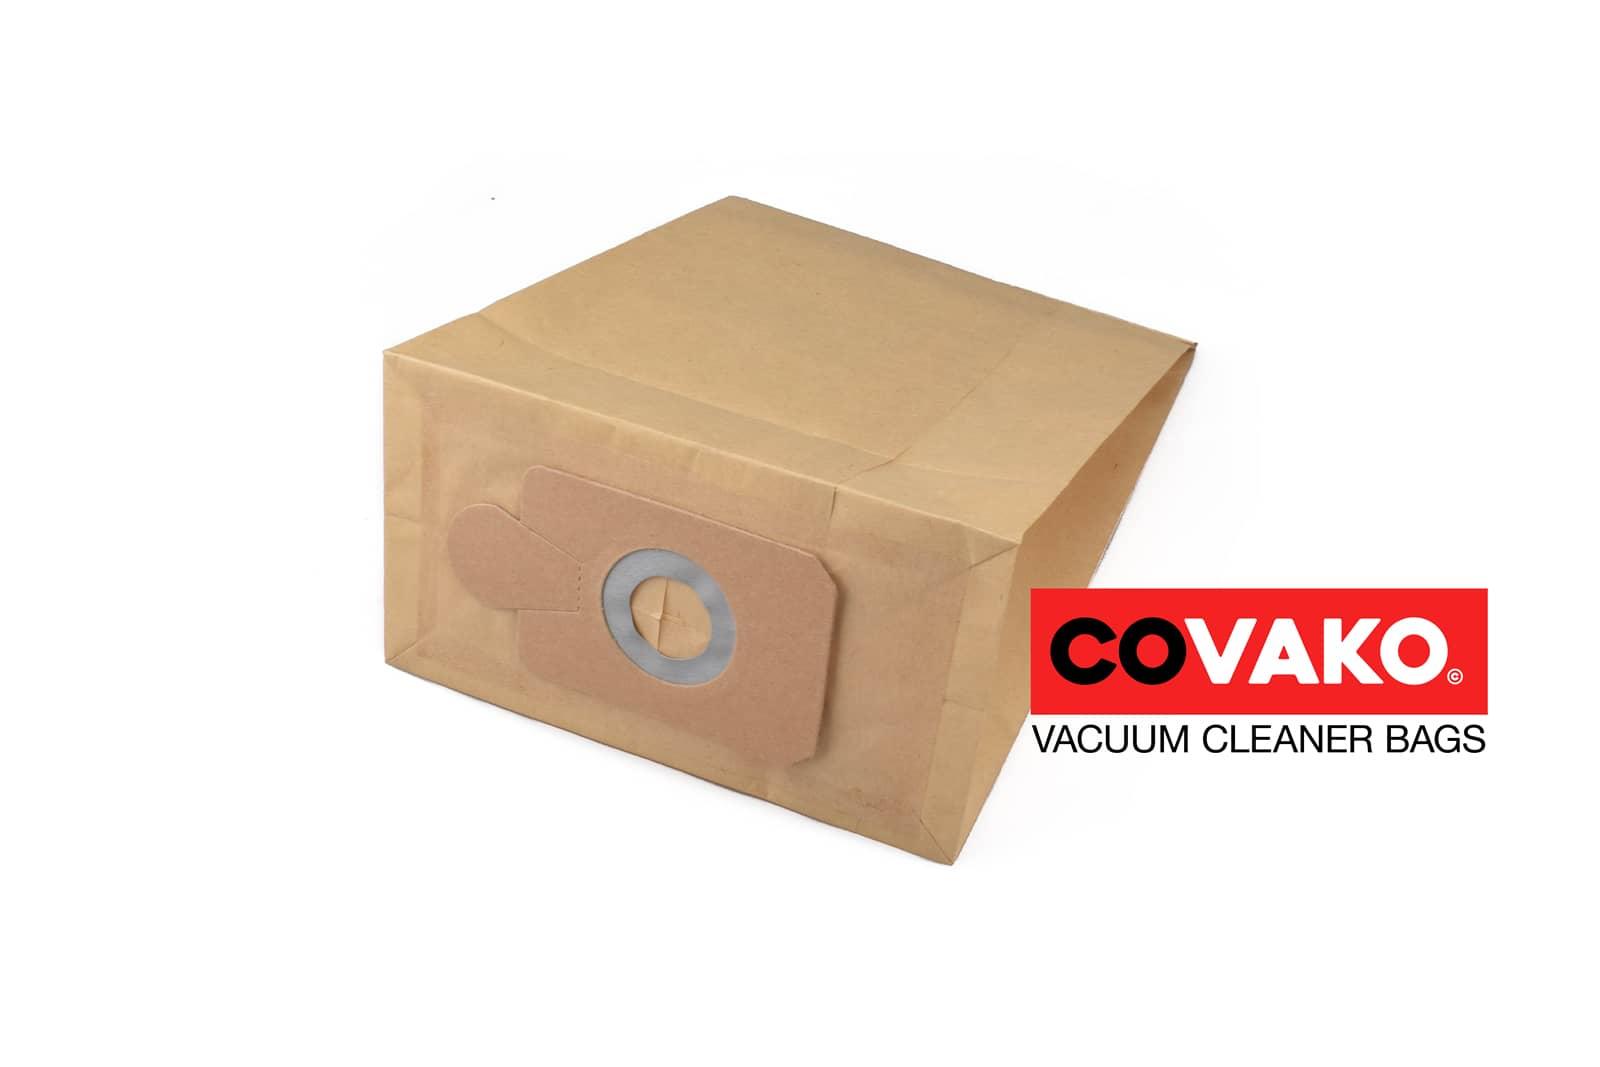 Numatic HVB 160-12 / Papier - Numatic stofzuigerzakken